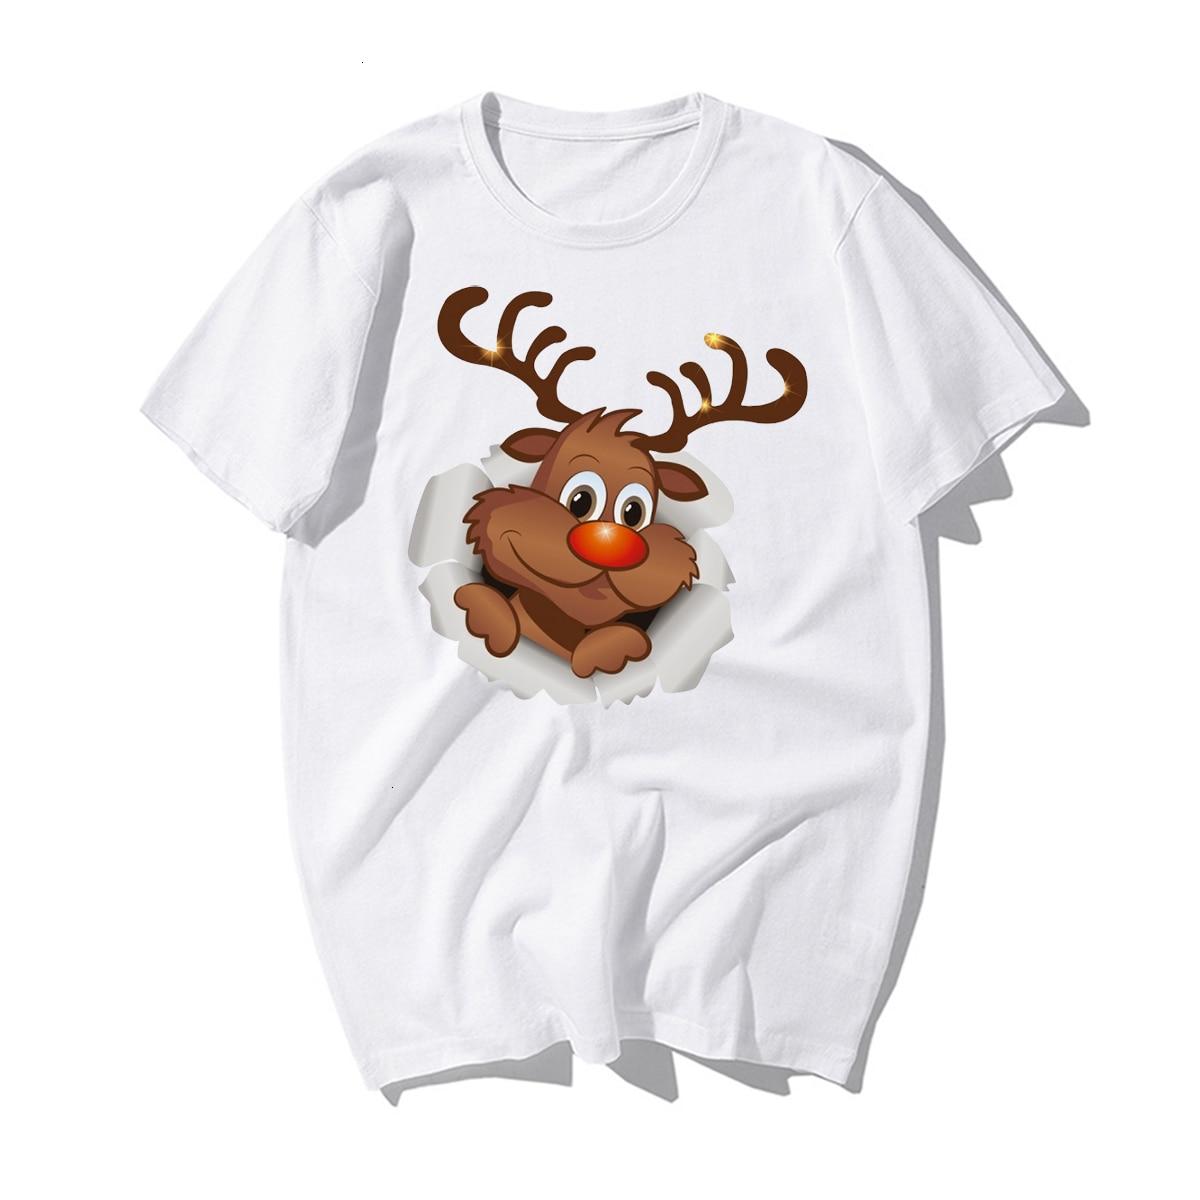 Funny Santa Claus Reindeer Lover CHRISTMAS GIFT T-SHIRT Happy New Year T Shirt Man Tshirt Merry CHRISTMAS Casual Cotton Kawaii 8